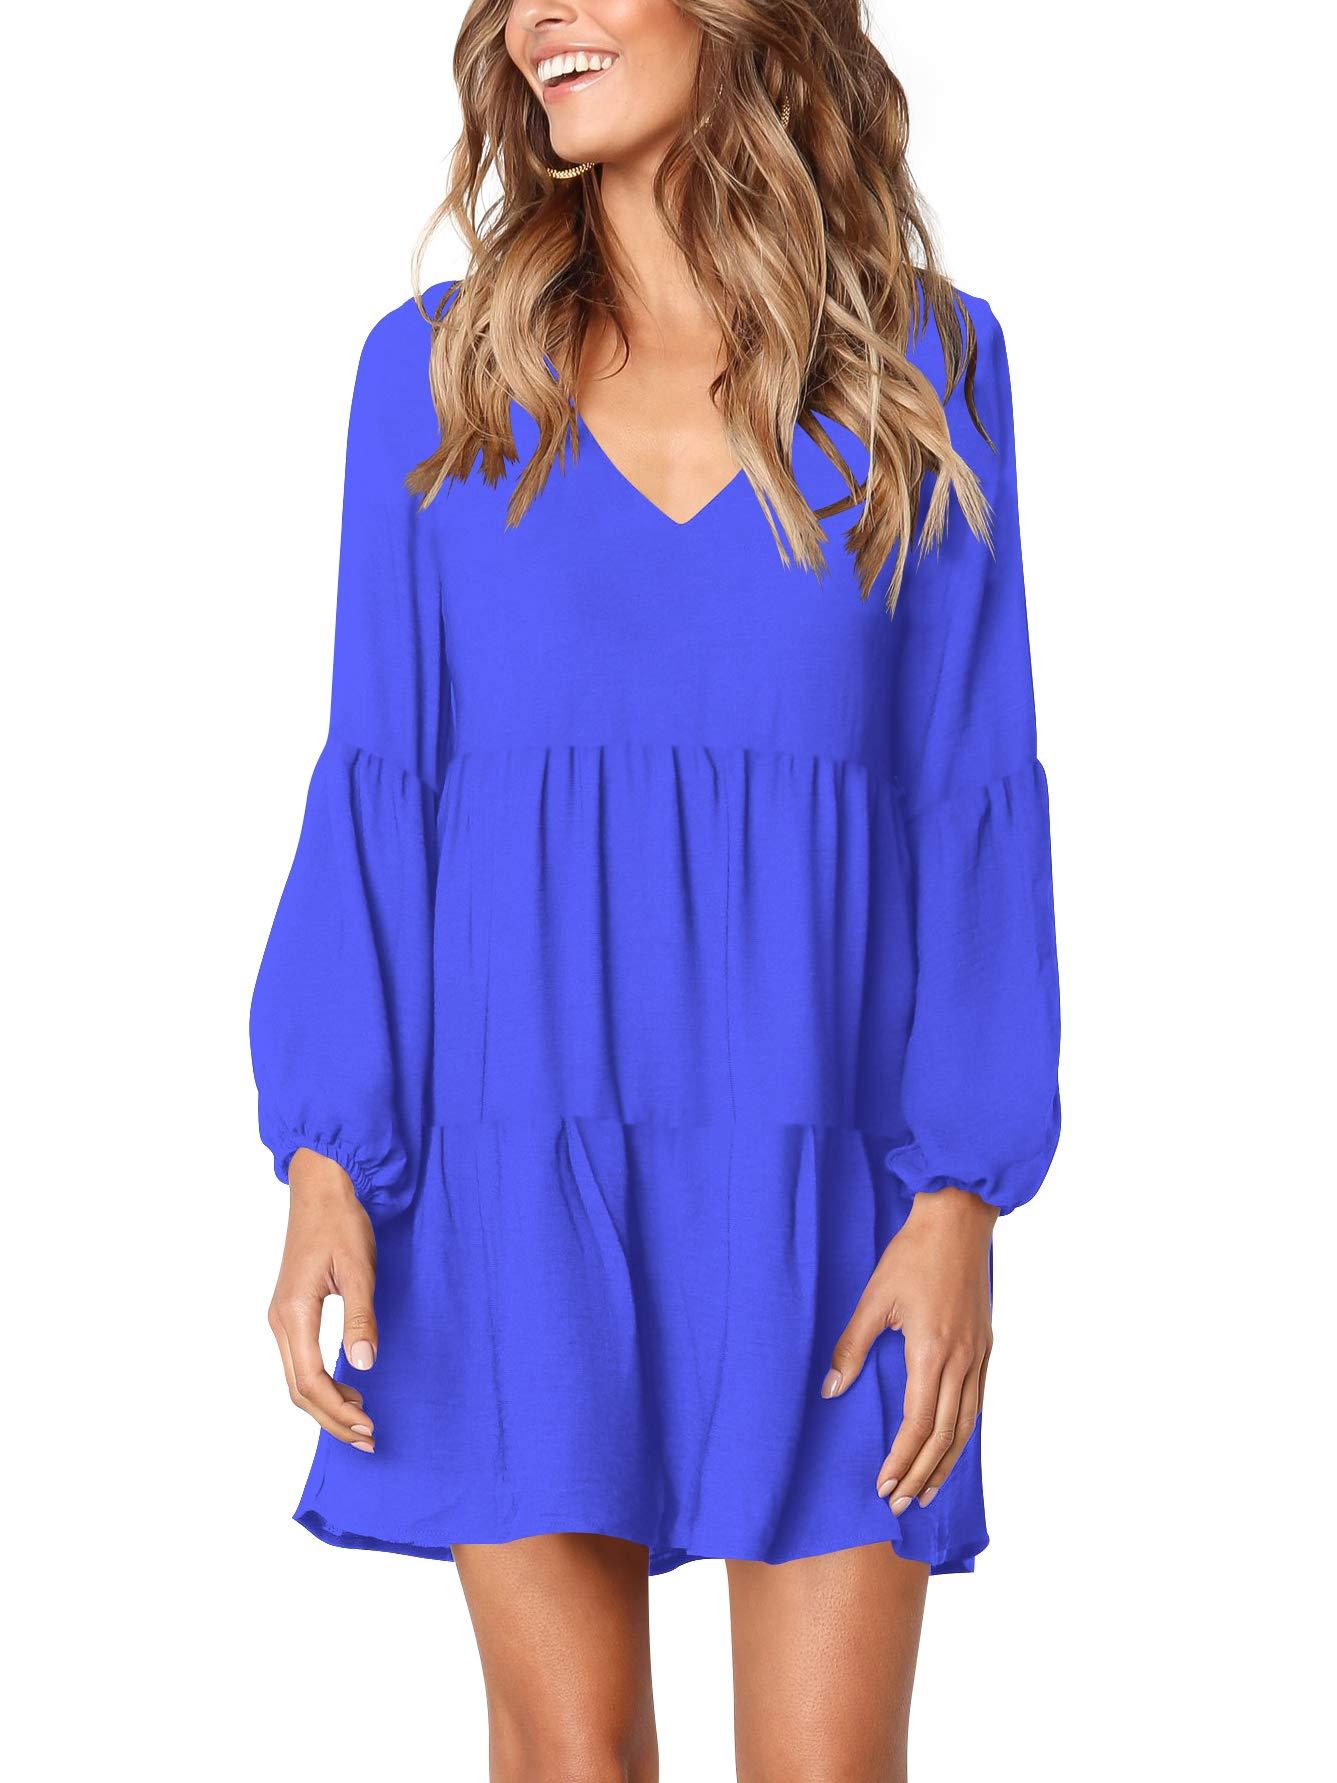 Amoretu Long Sleeve Dresses for Women Casual Summer V Neck Shift Tunic Dress Blue L